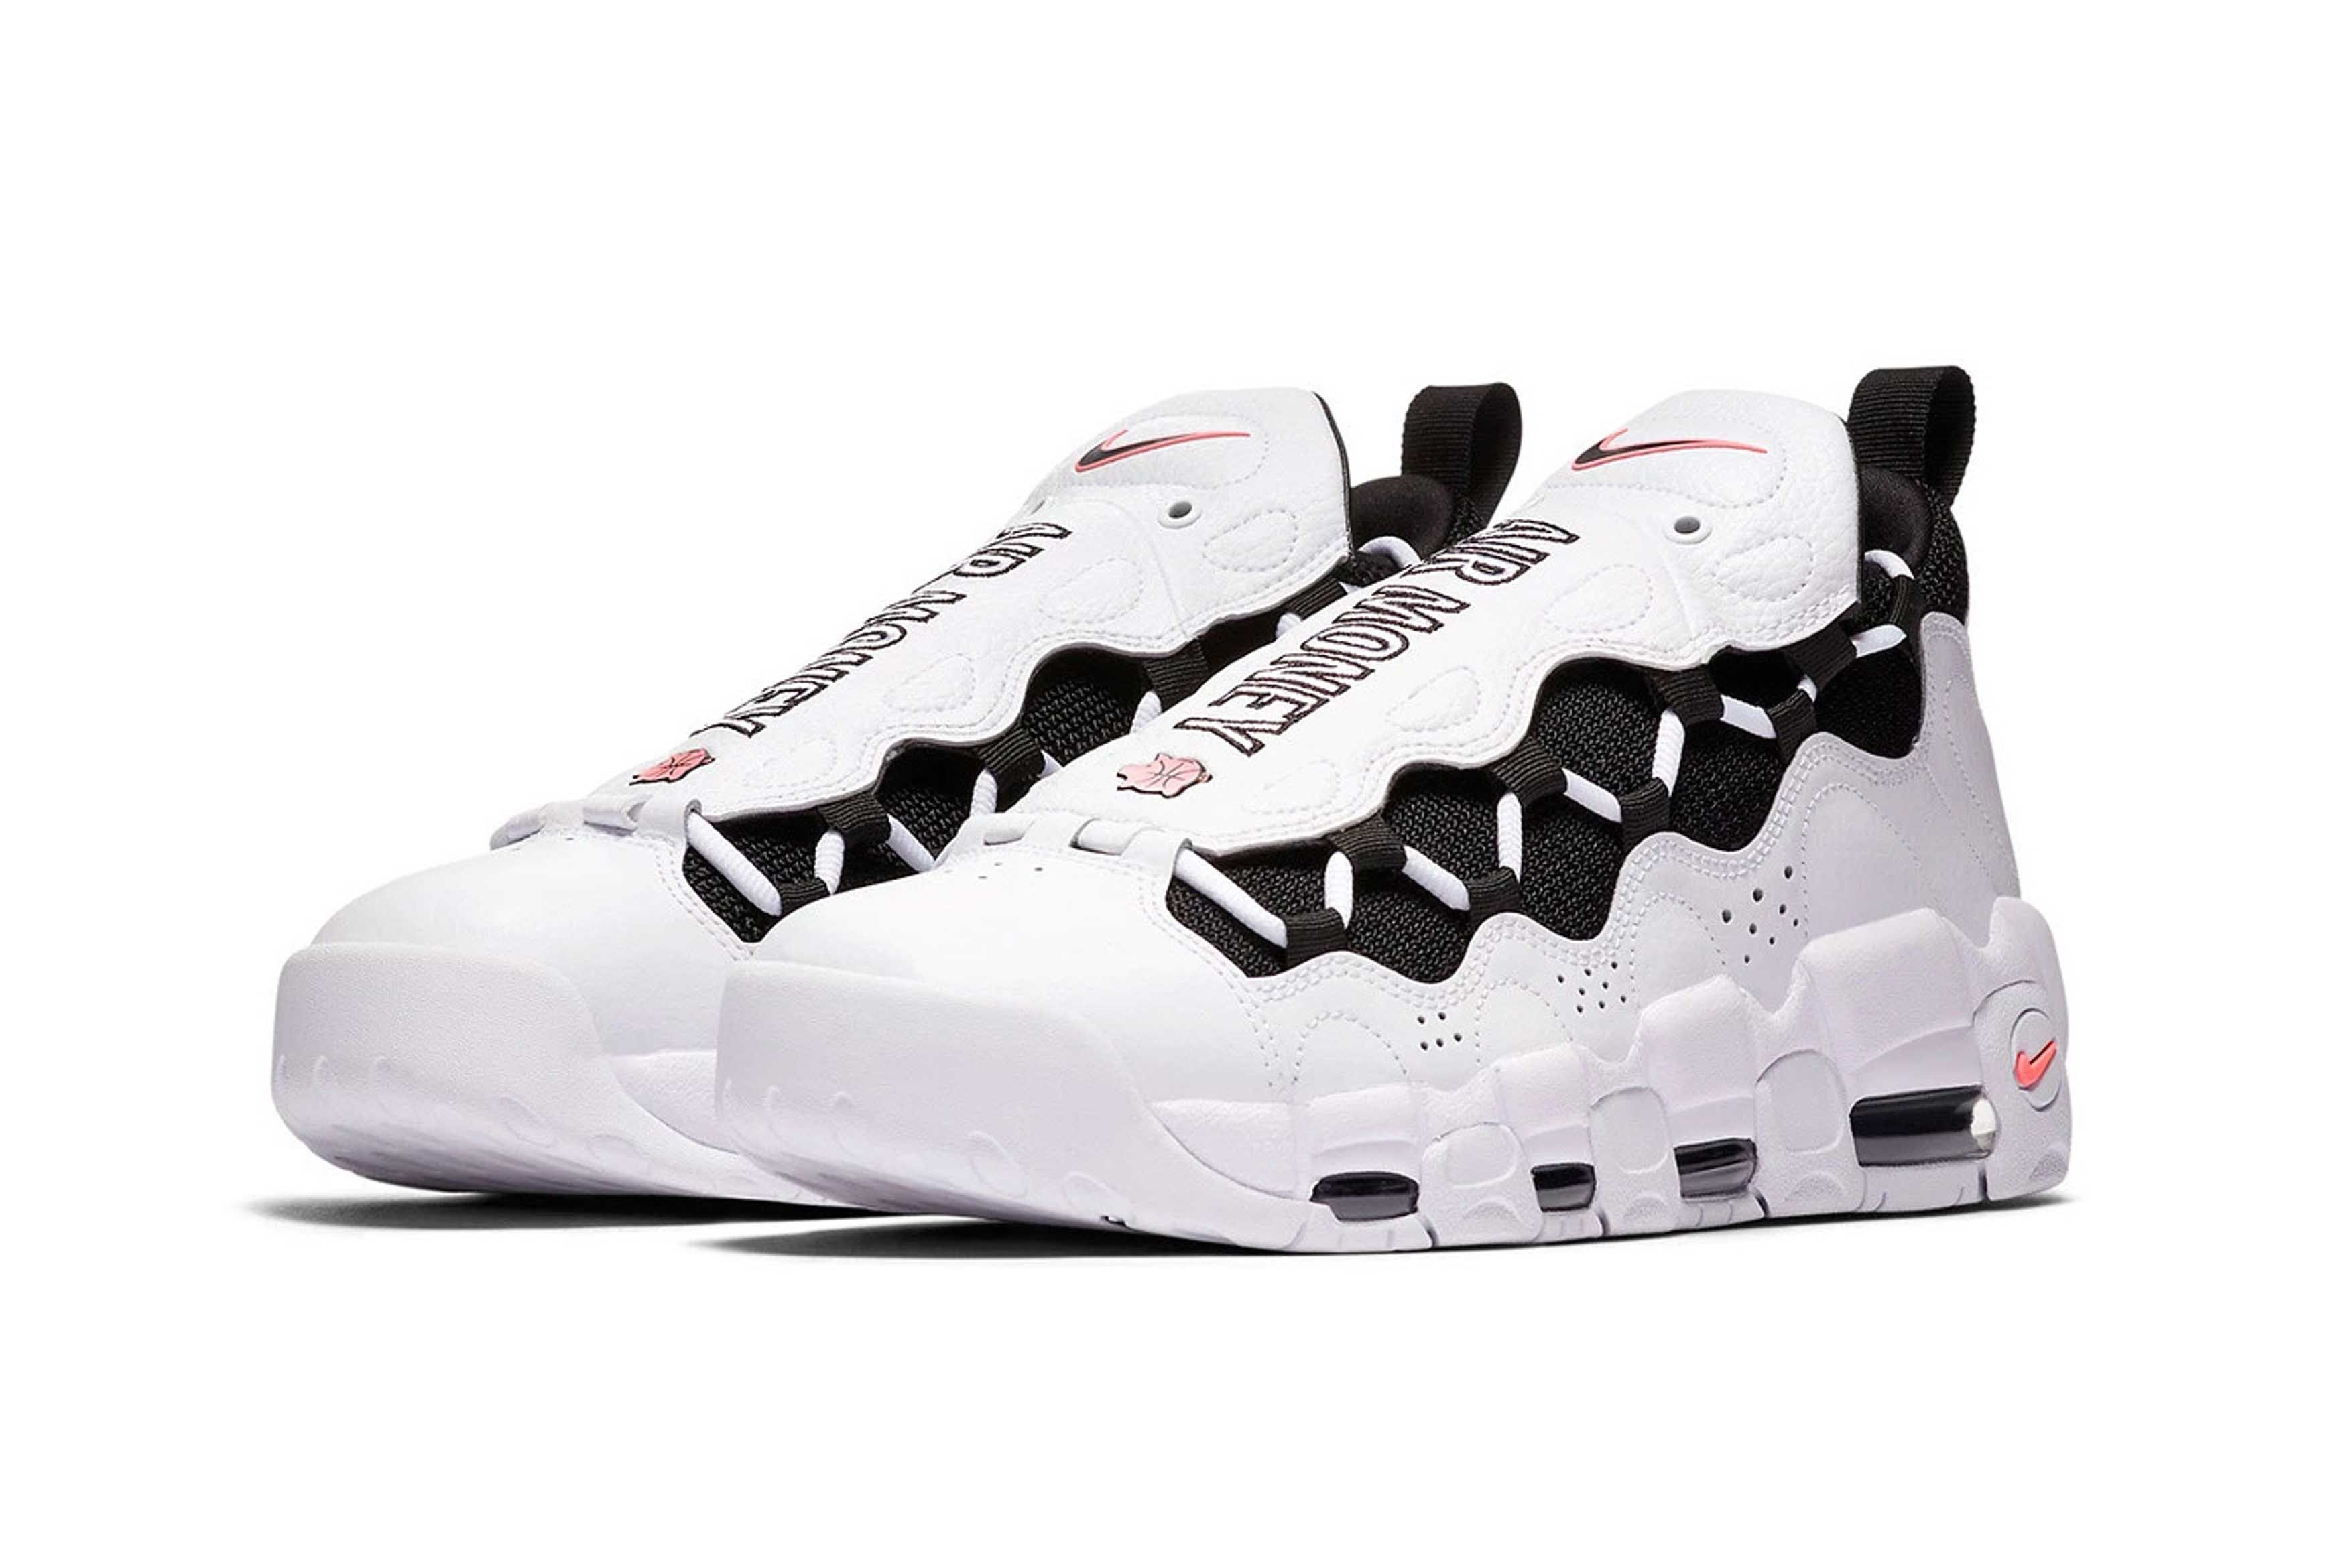 Nike Air More Money Piggy Bank Release Date 1 Sneaker Freaker